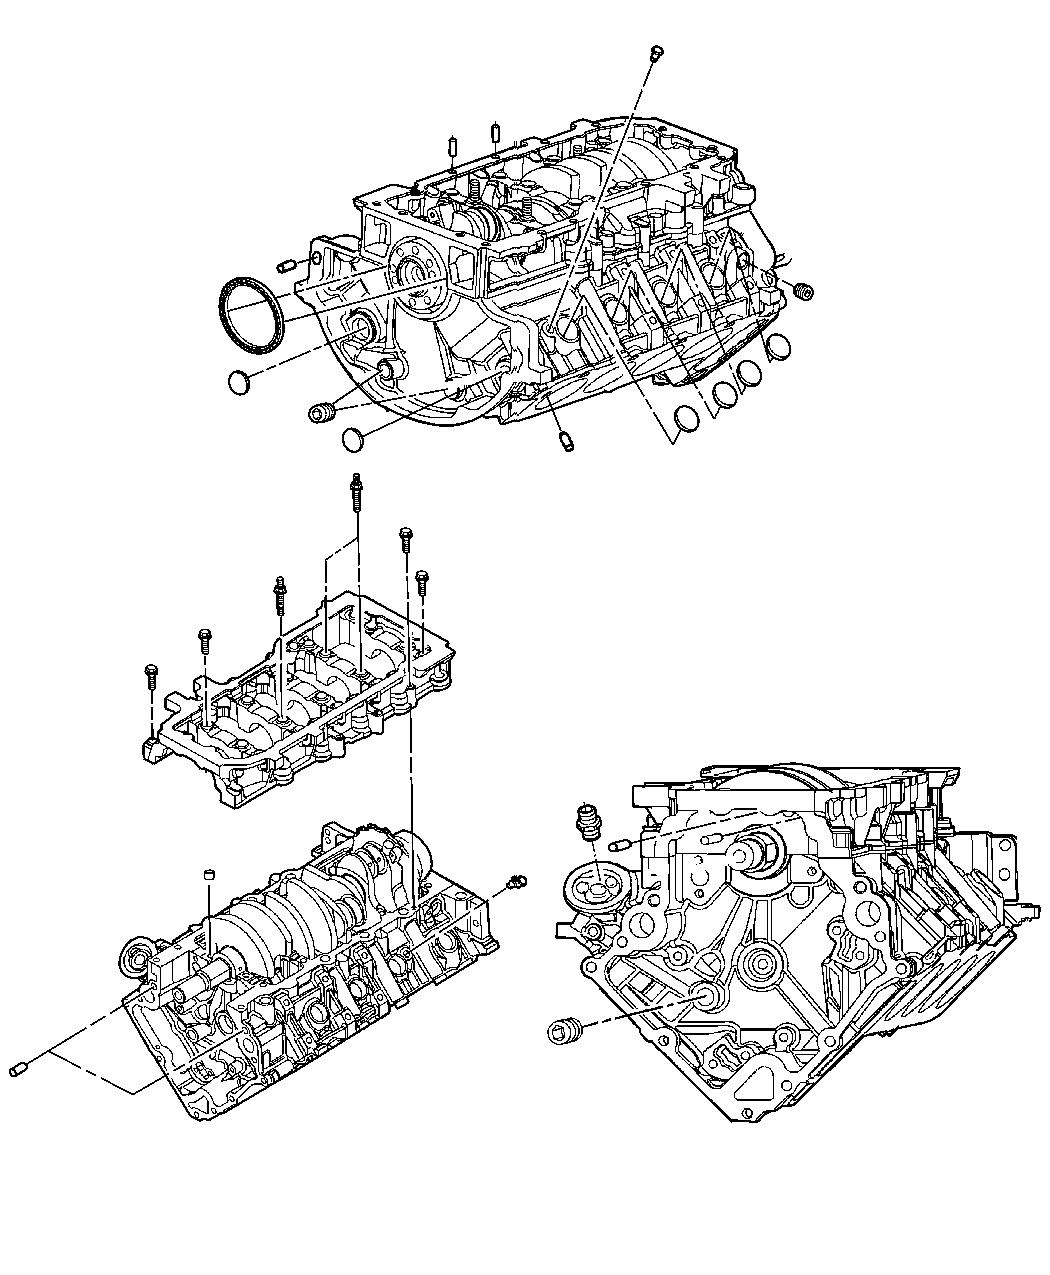 Dodge Ram Engine Cylinder Block And Hardware 4 7l Eve